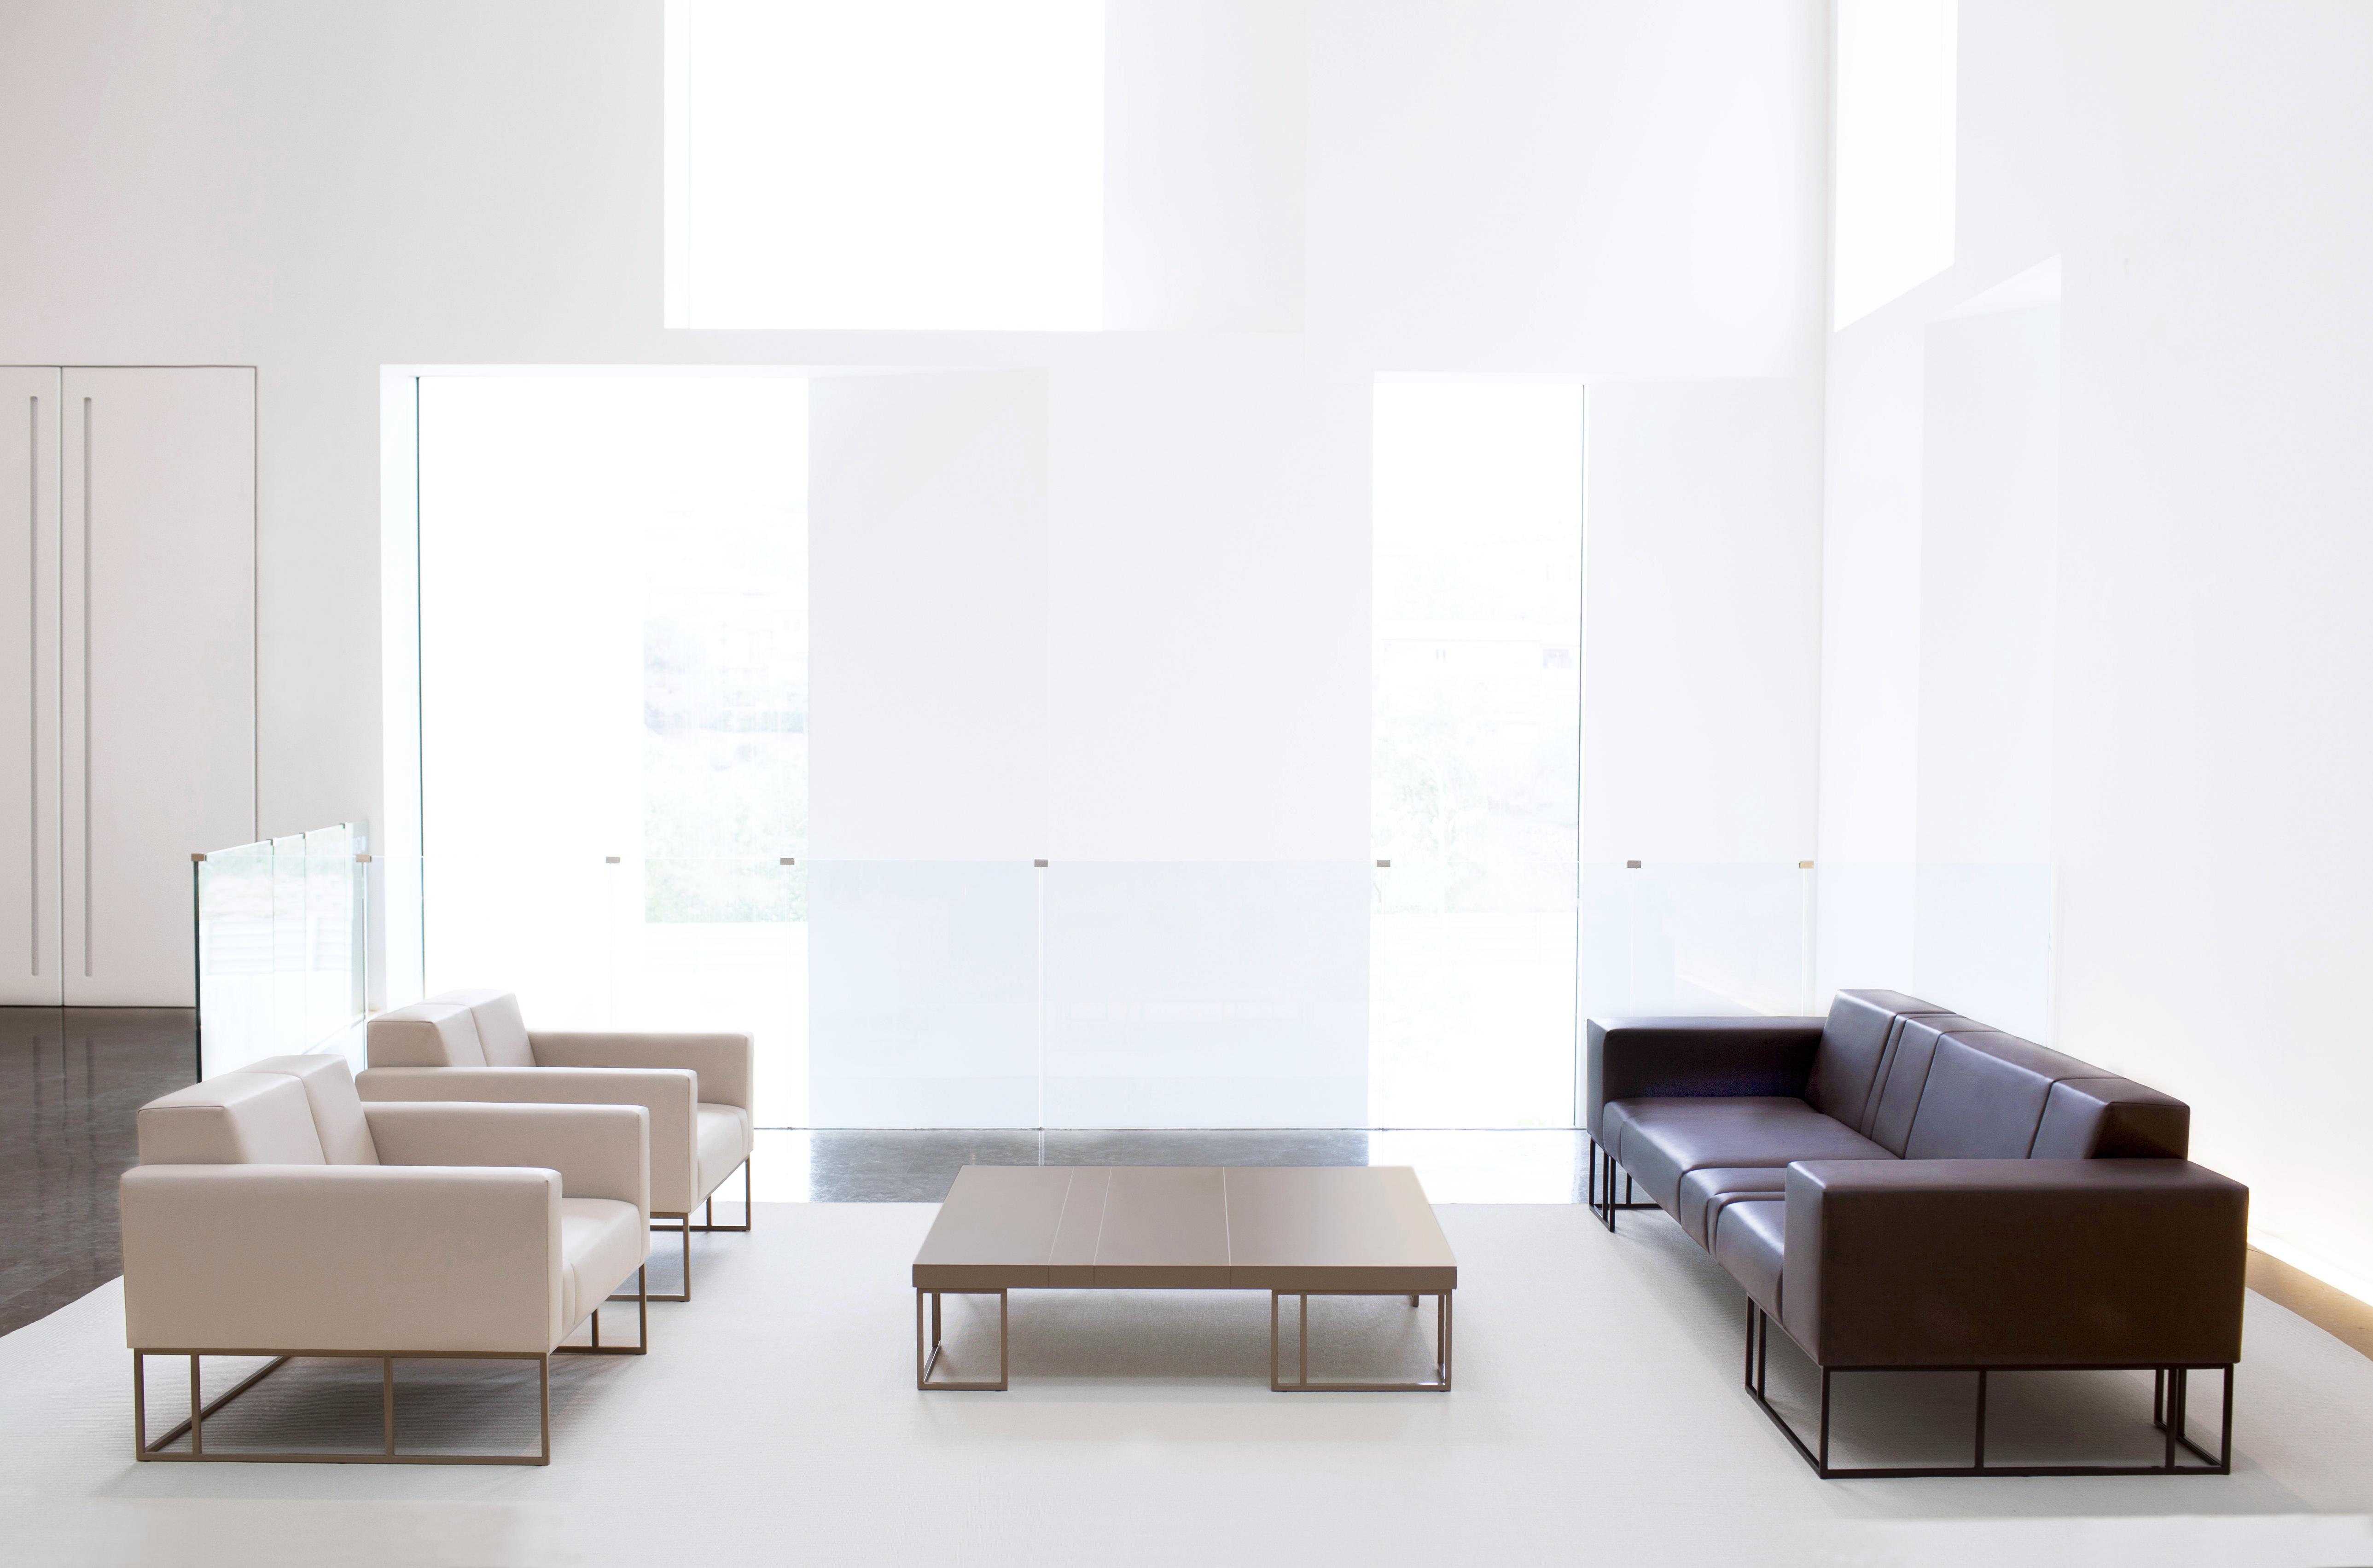 mobiliario hogar galeria4 - mobiliario de hogar